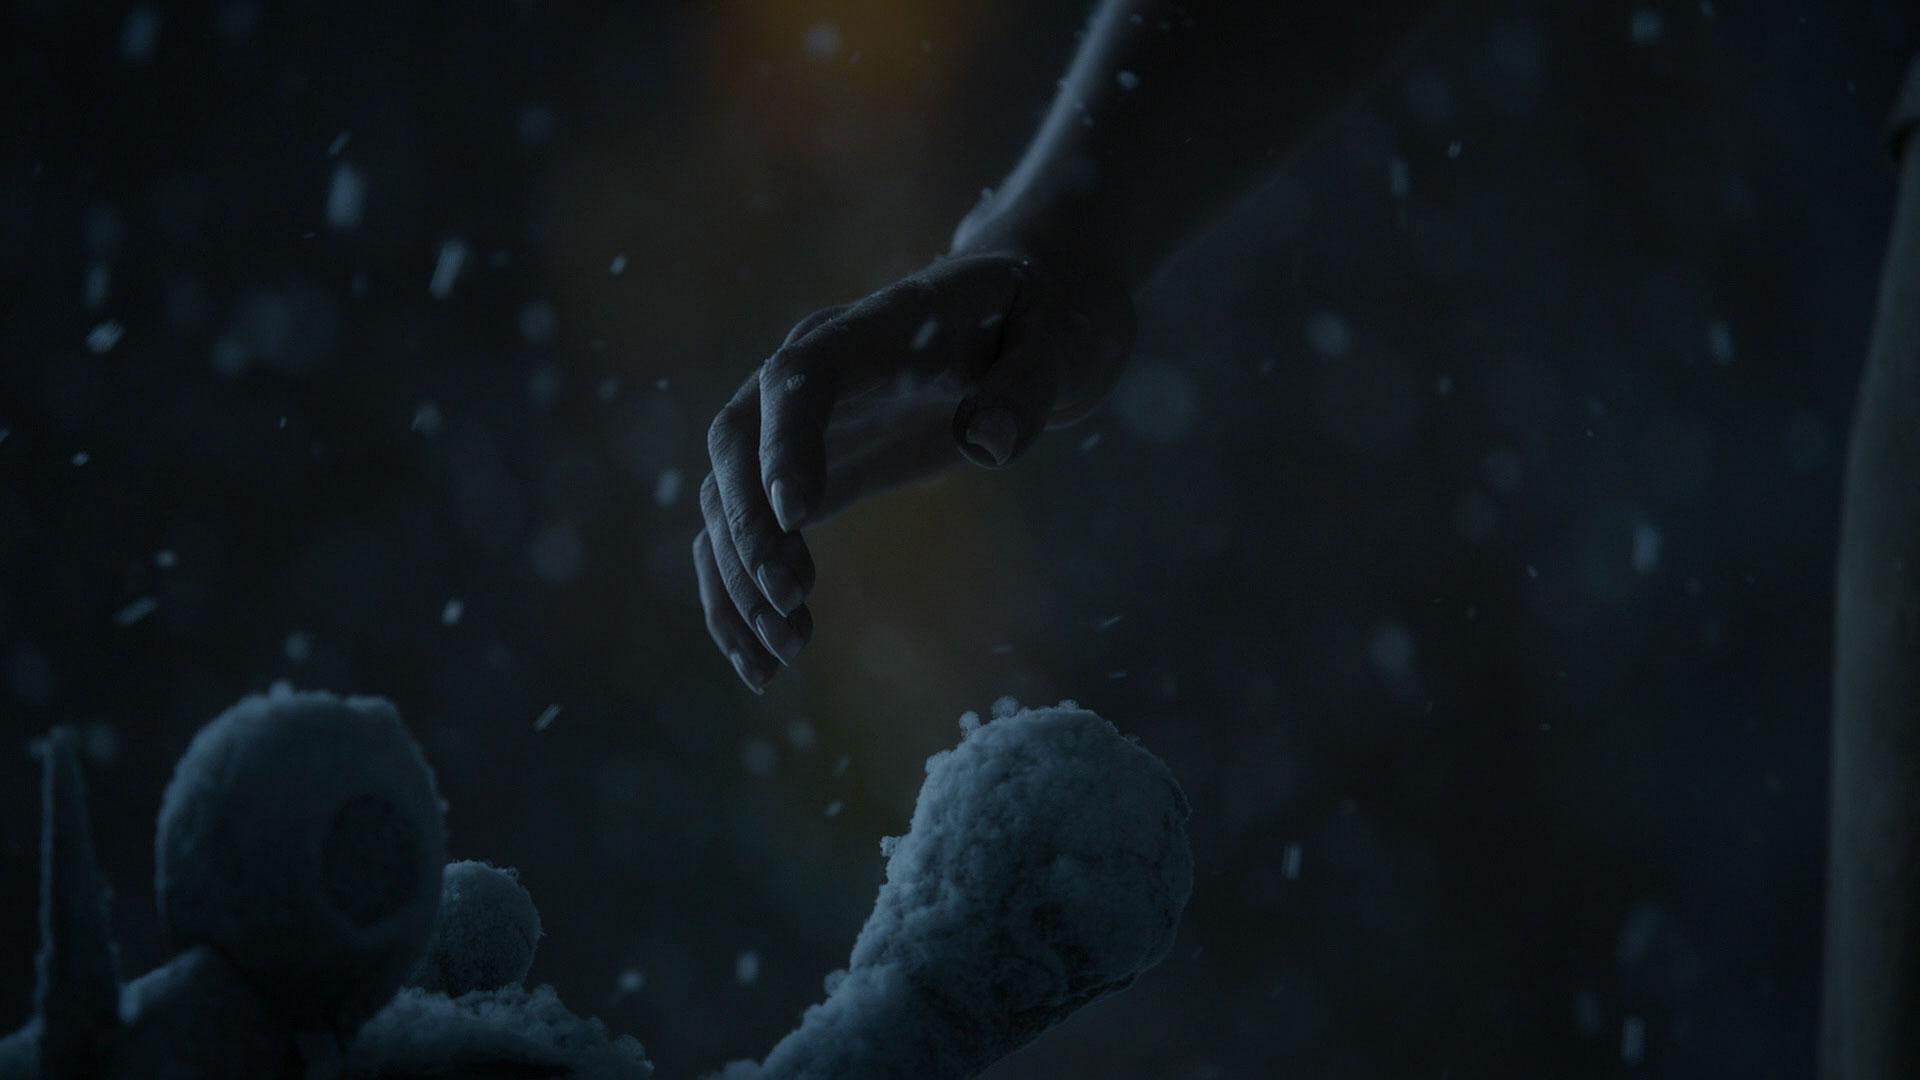 game-of-thrones-season-02-episode-10-screenshot-318.jpg